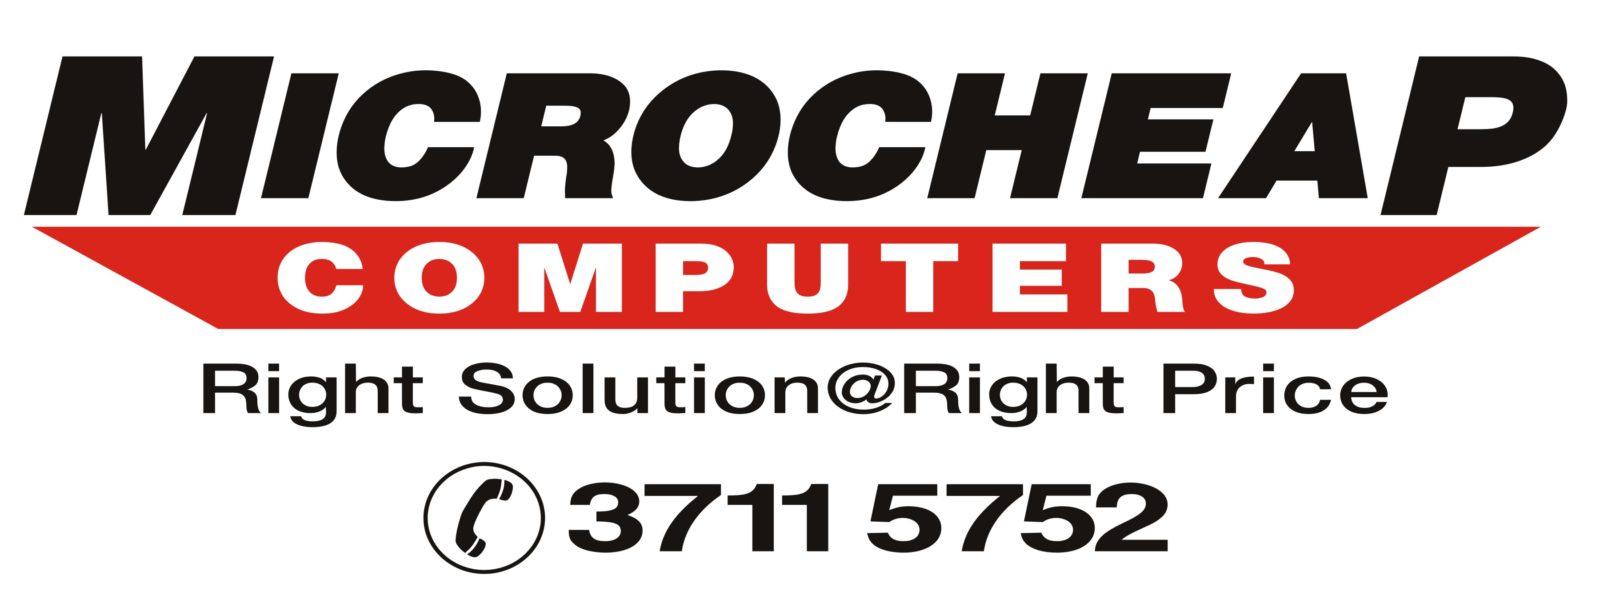 Microcheap Computers